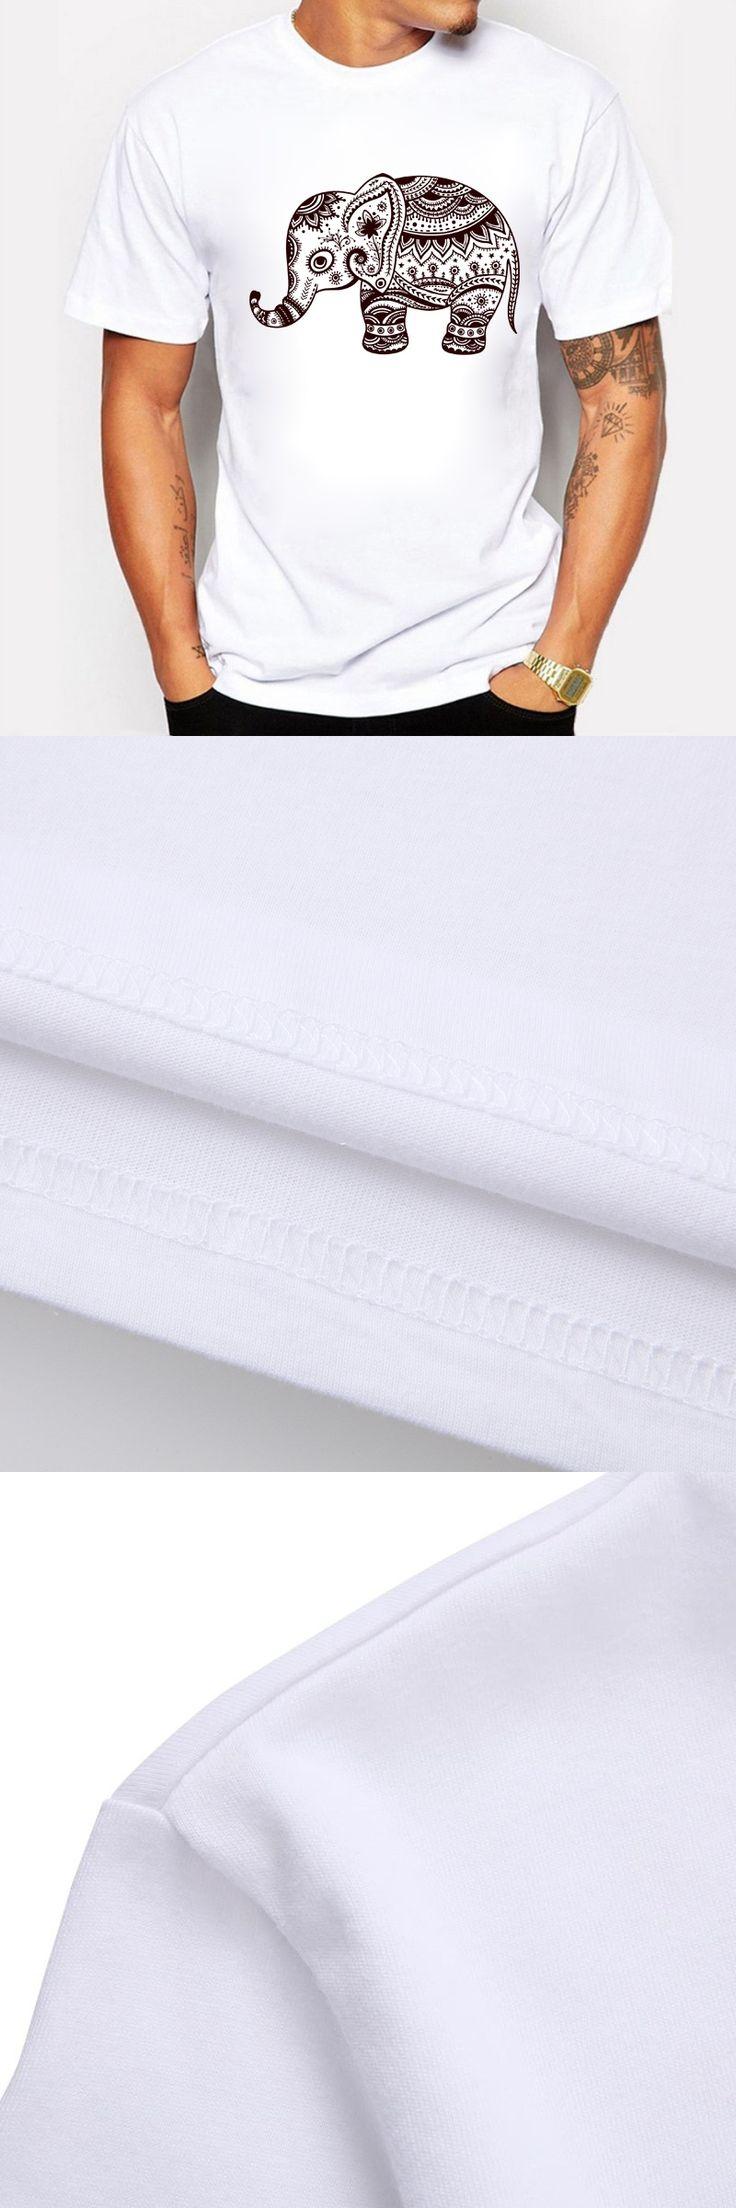 Men T-shirt Summer Style Man Tops Elephant Cartoon Animal Print Short Sleeve Chinese National Wind Pattern Tee Shirt Male White